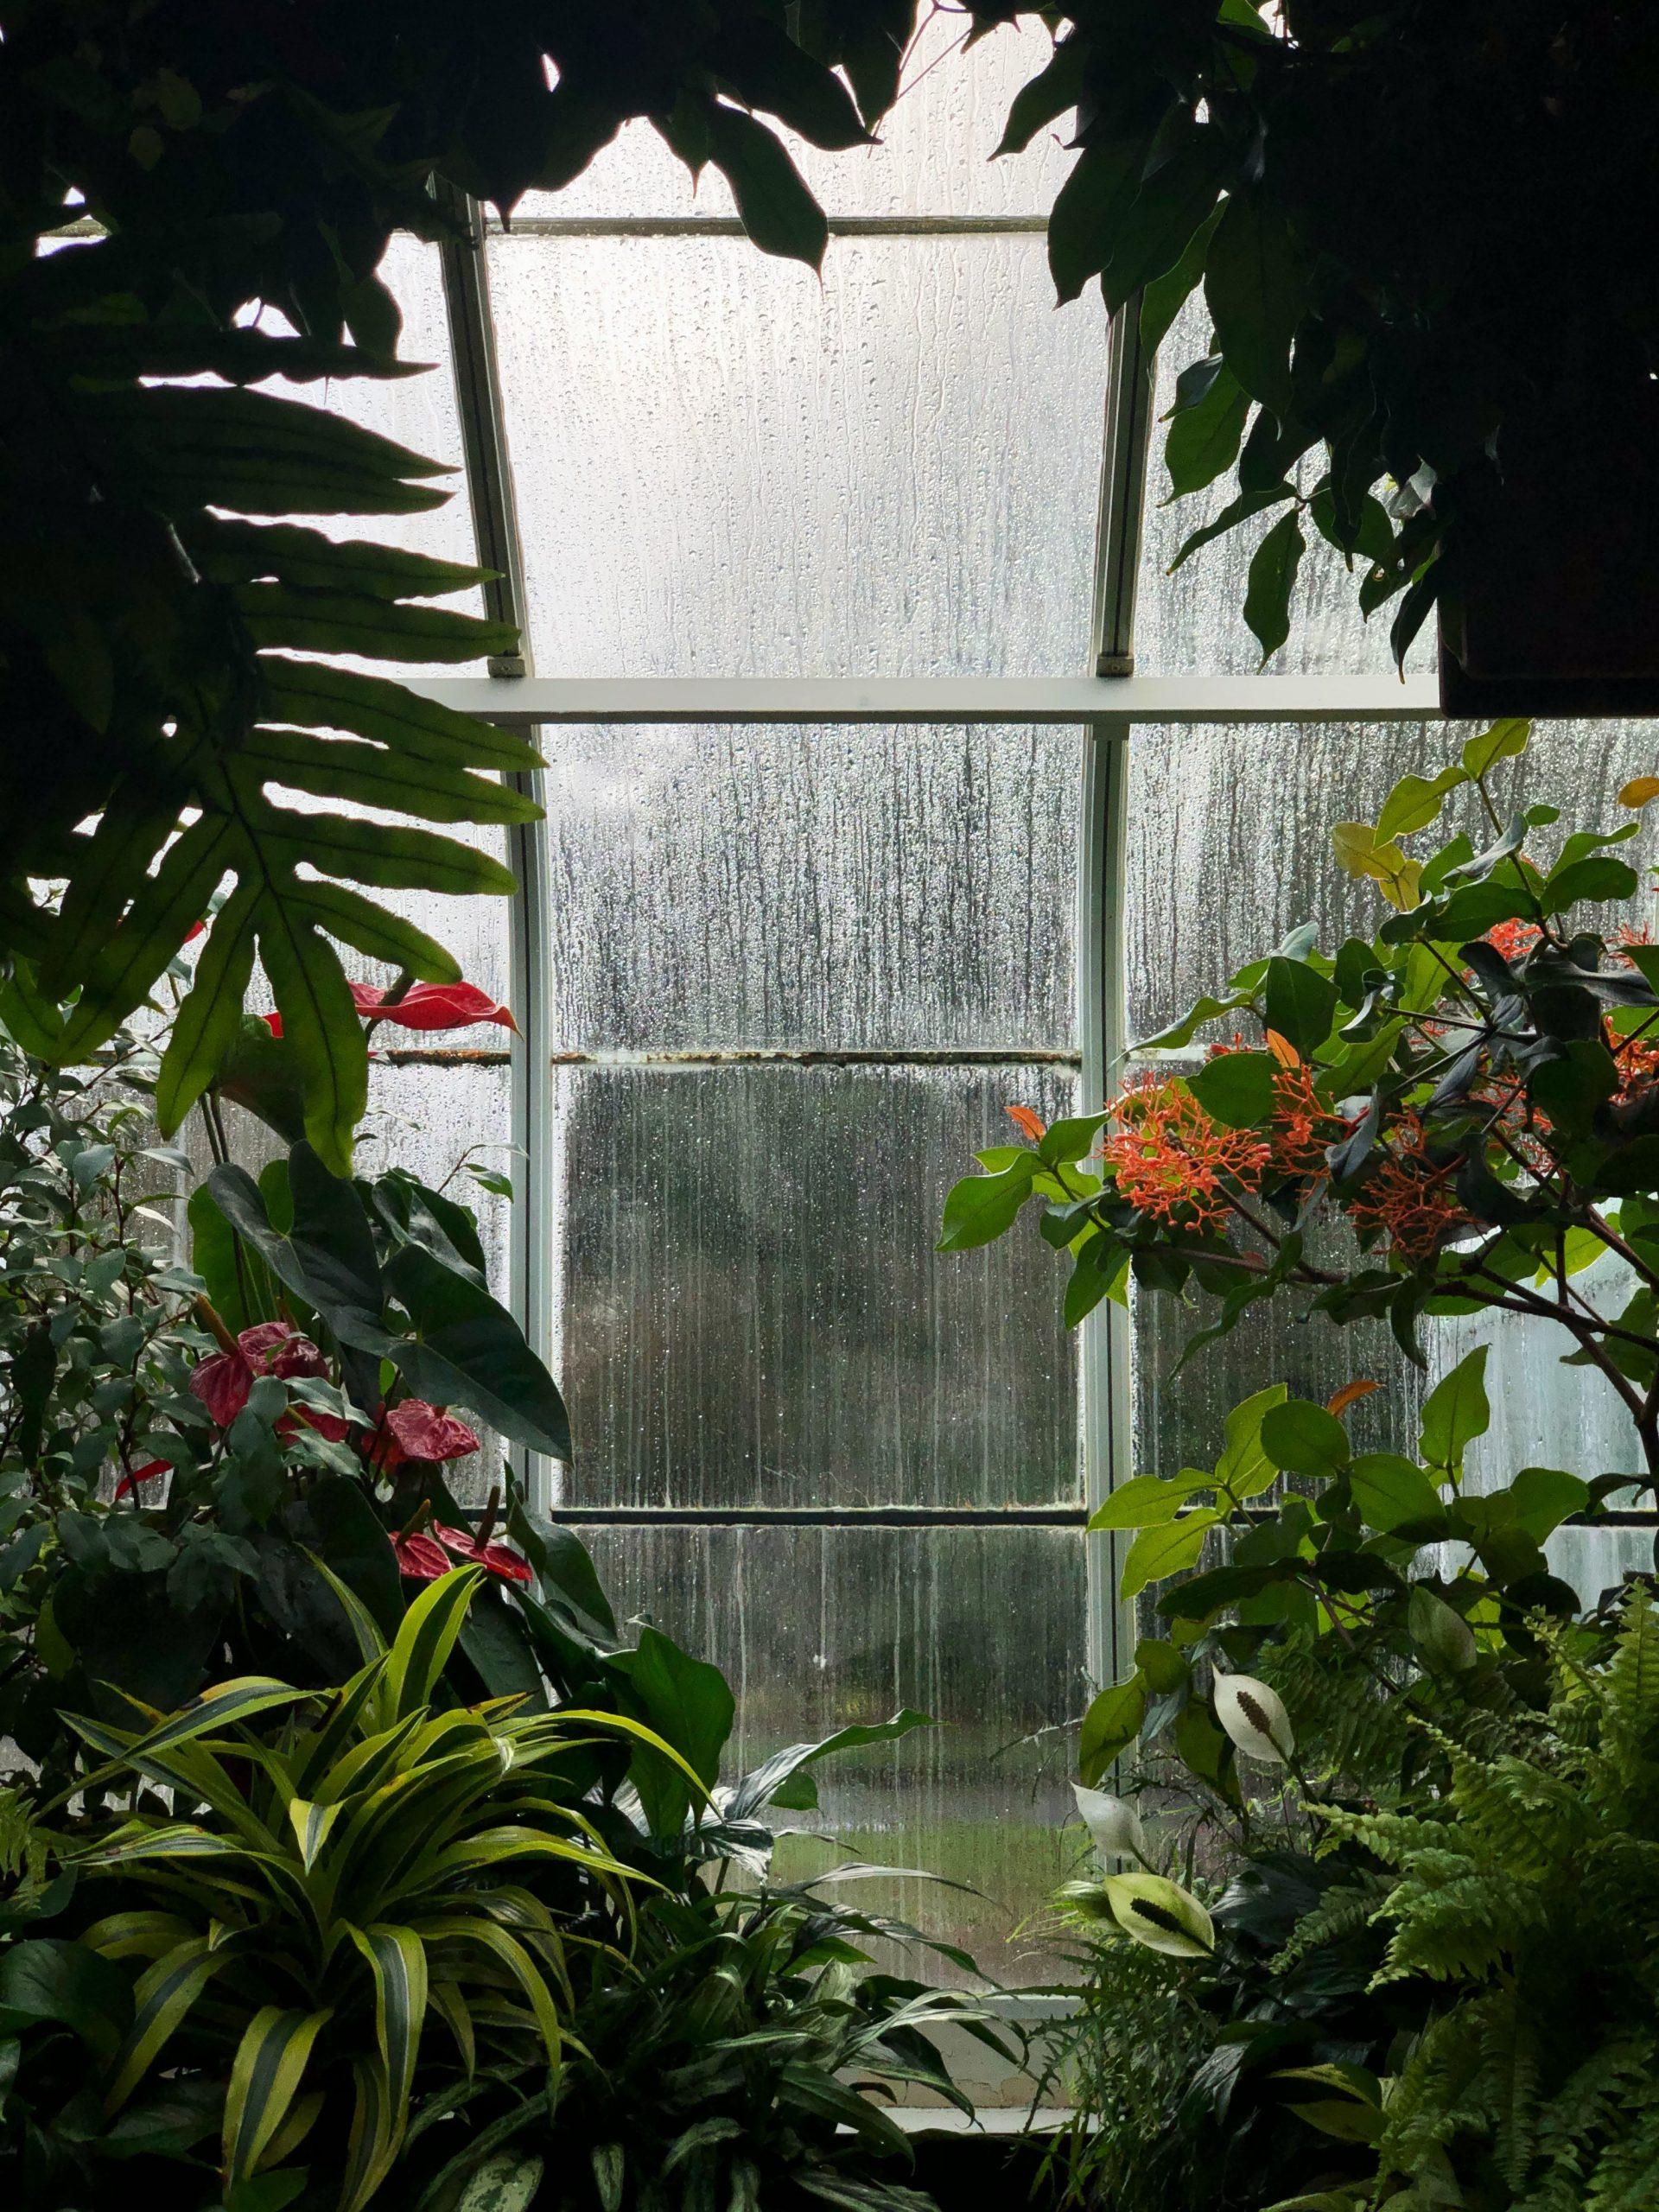 Raining Greenhouse